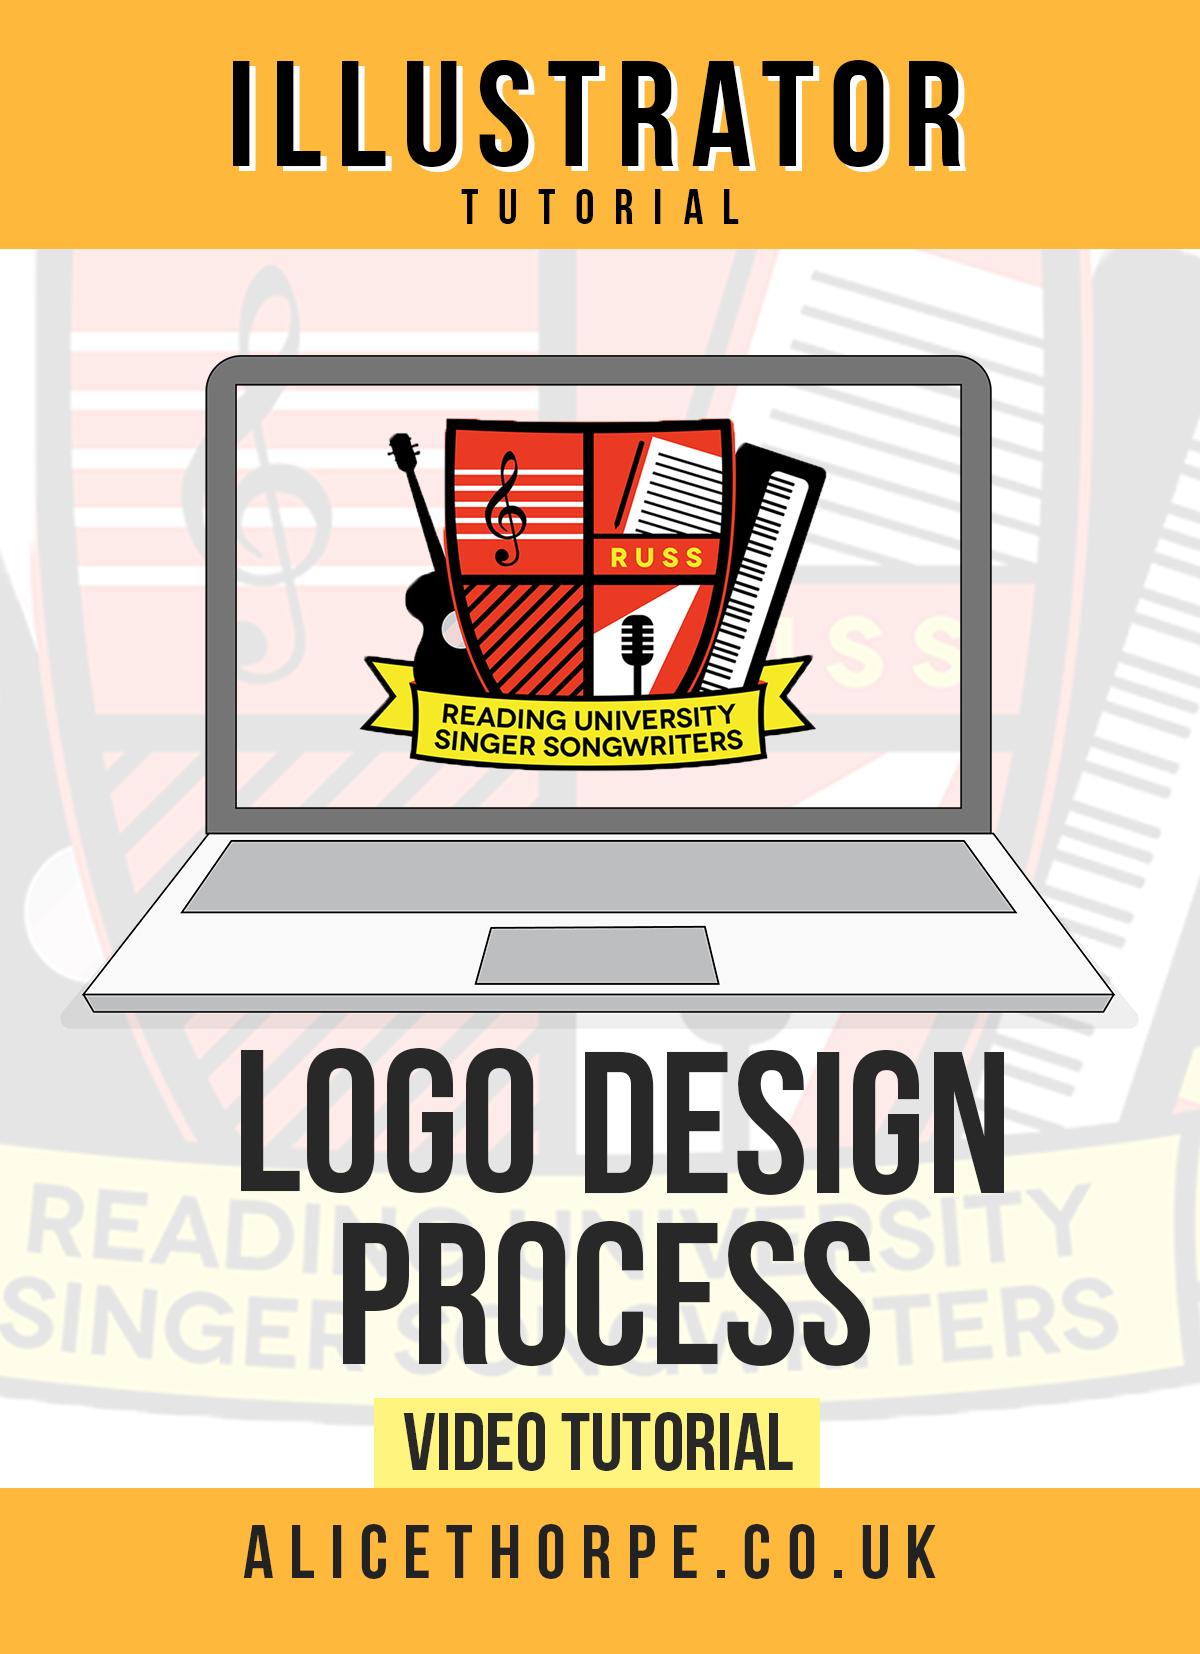 Free Adobe Illustrator tutorial. Logo design by Alice Thorpe